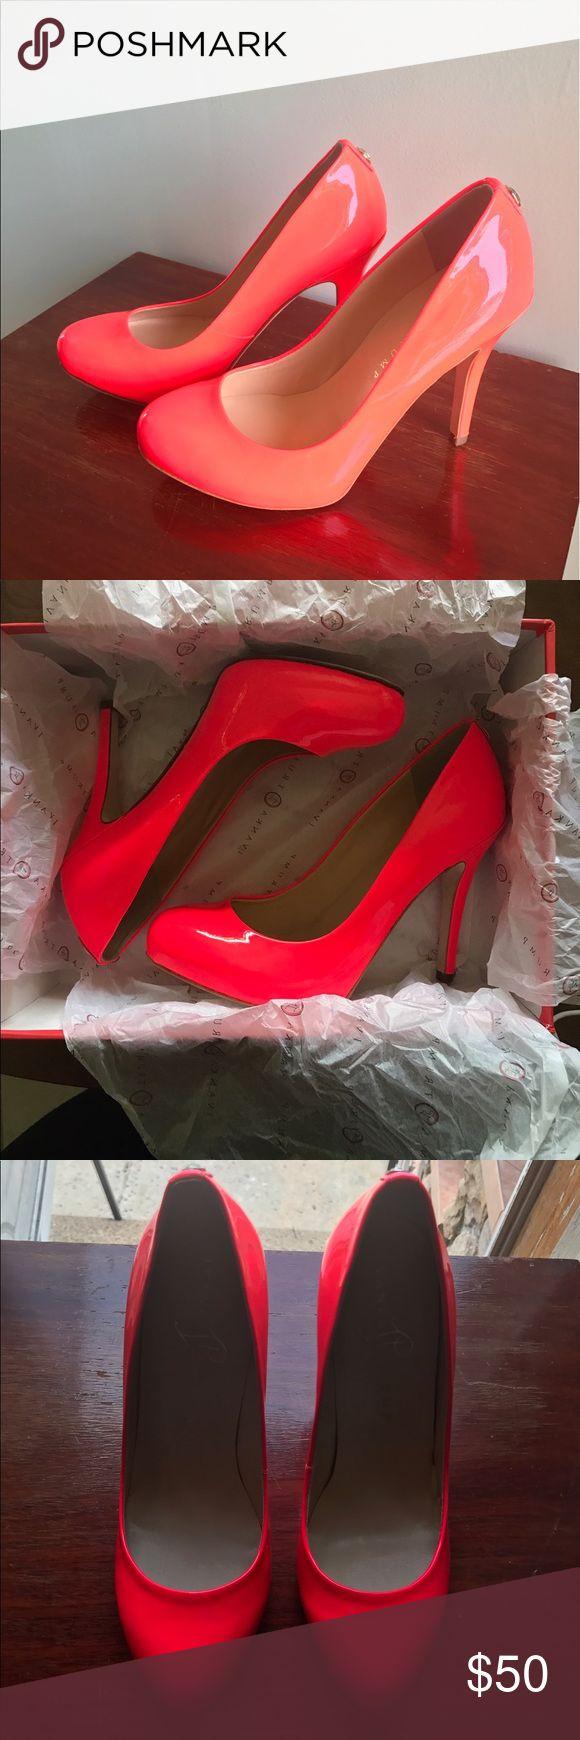 Ivanka Trump Pumps Reddish/Pink Ivanka Trump Pumps size 6.5. Brand new never worn and comes with box. Ivanka Trump Shoes Heels